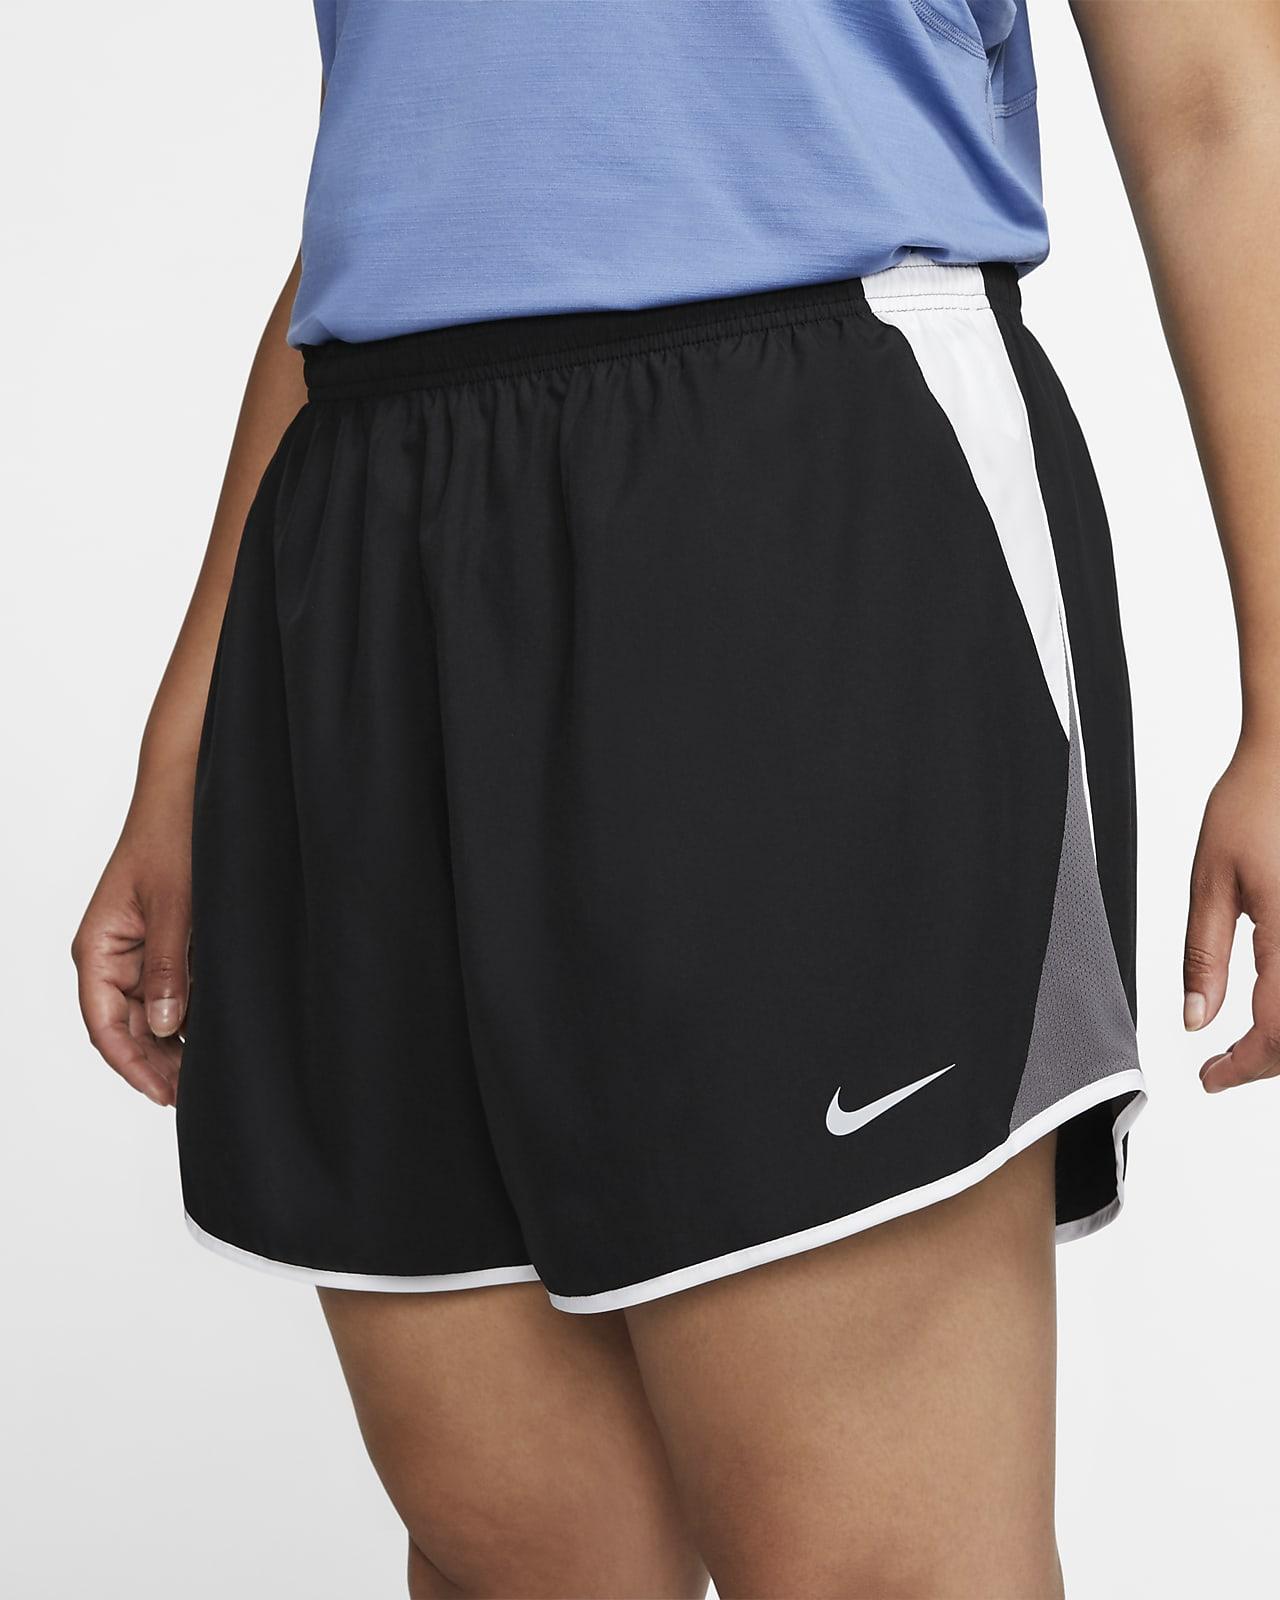 Shorts de running para mujer (talla grande) Nike